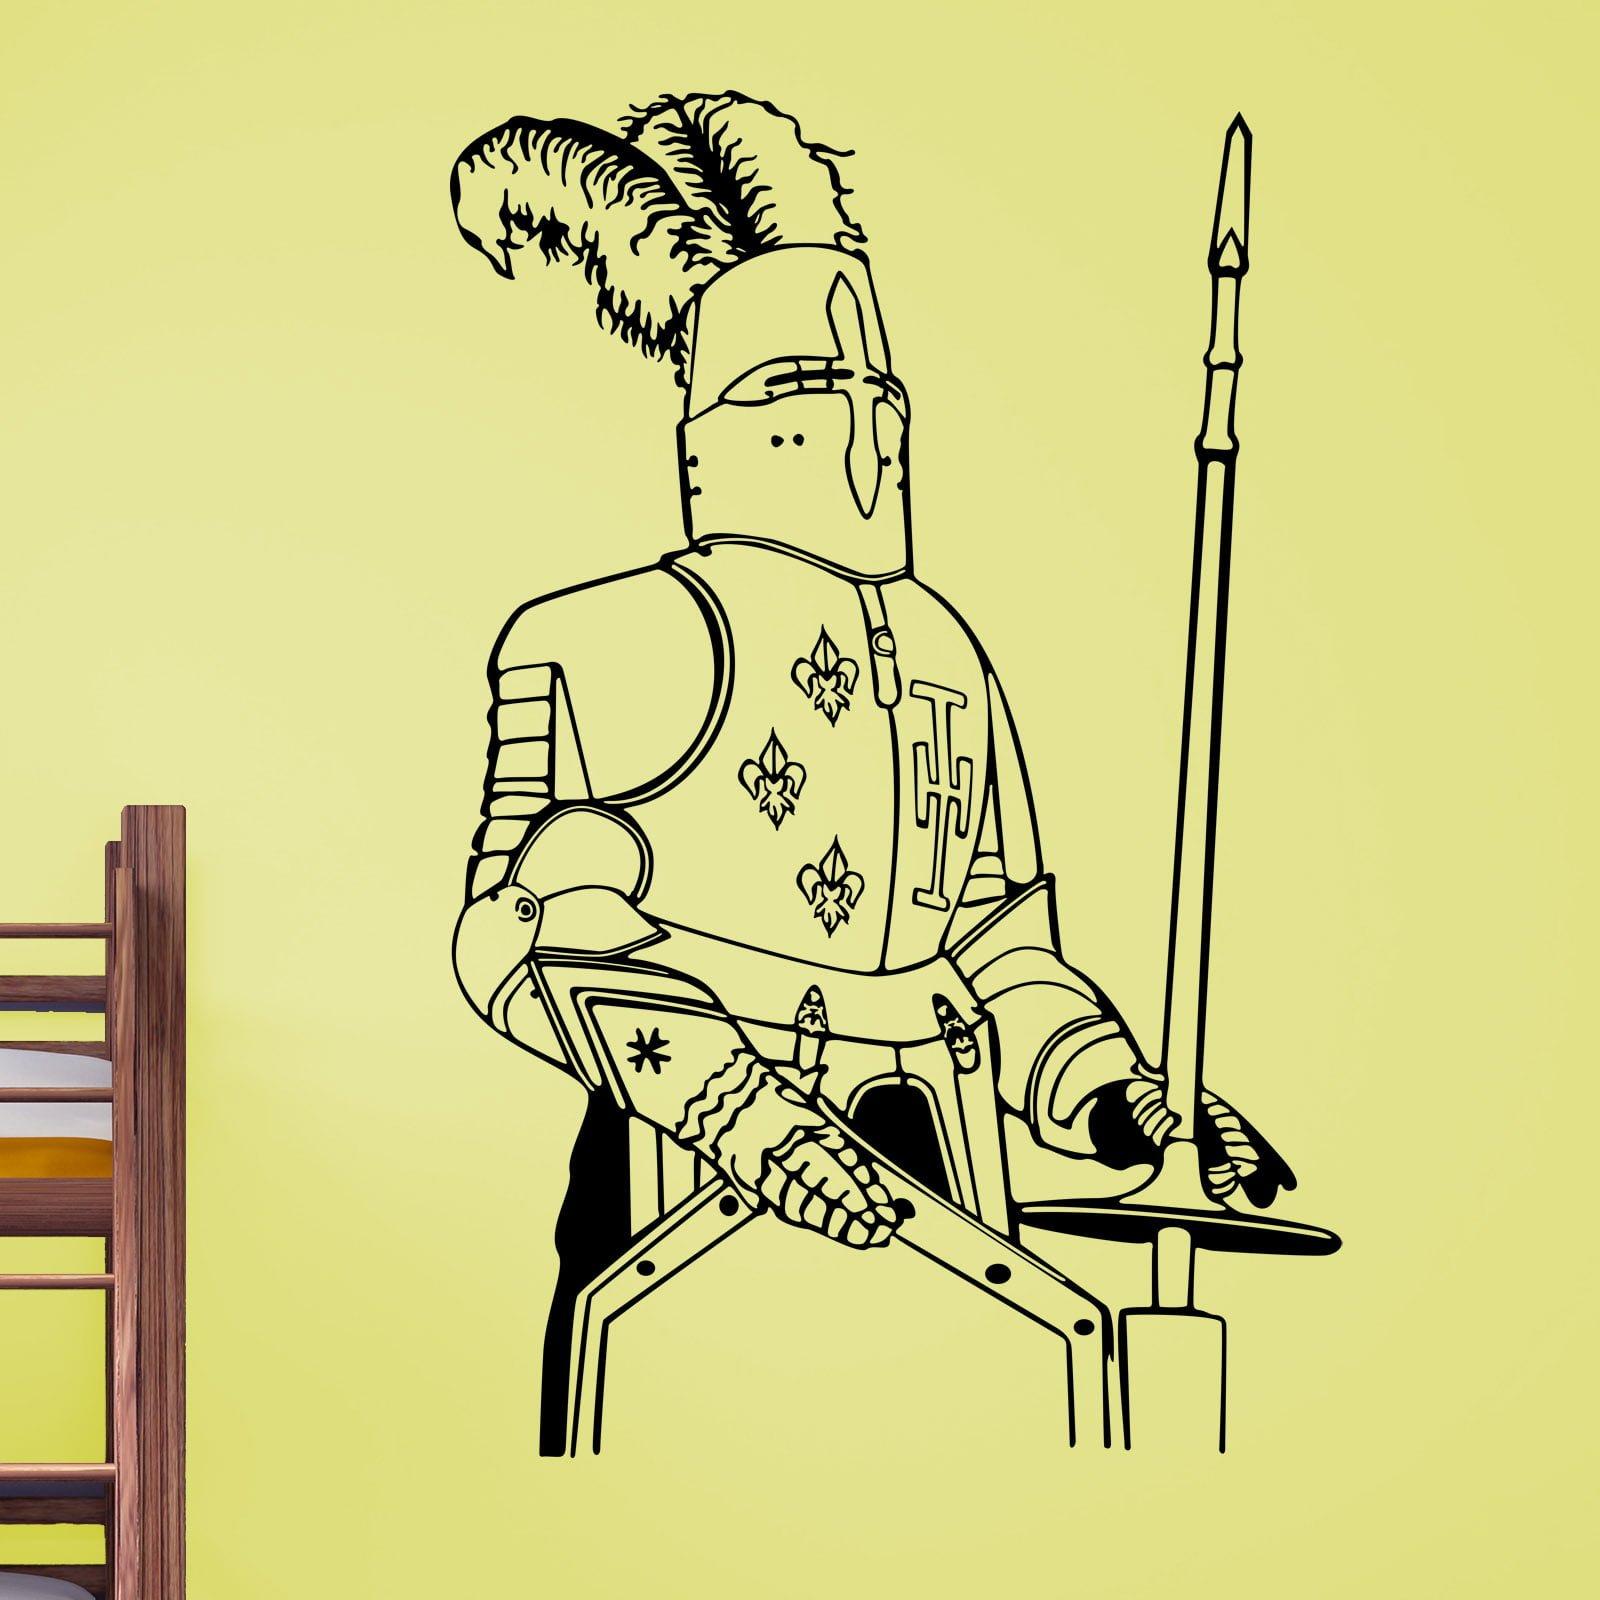 Knight Stood Kids Wall Sticker - World of Wall Stickers